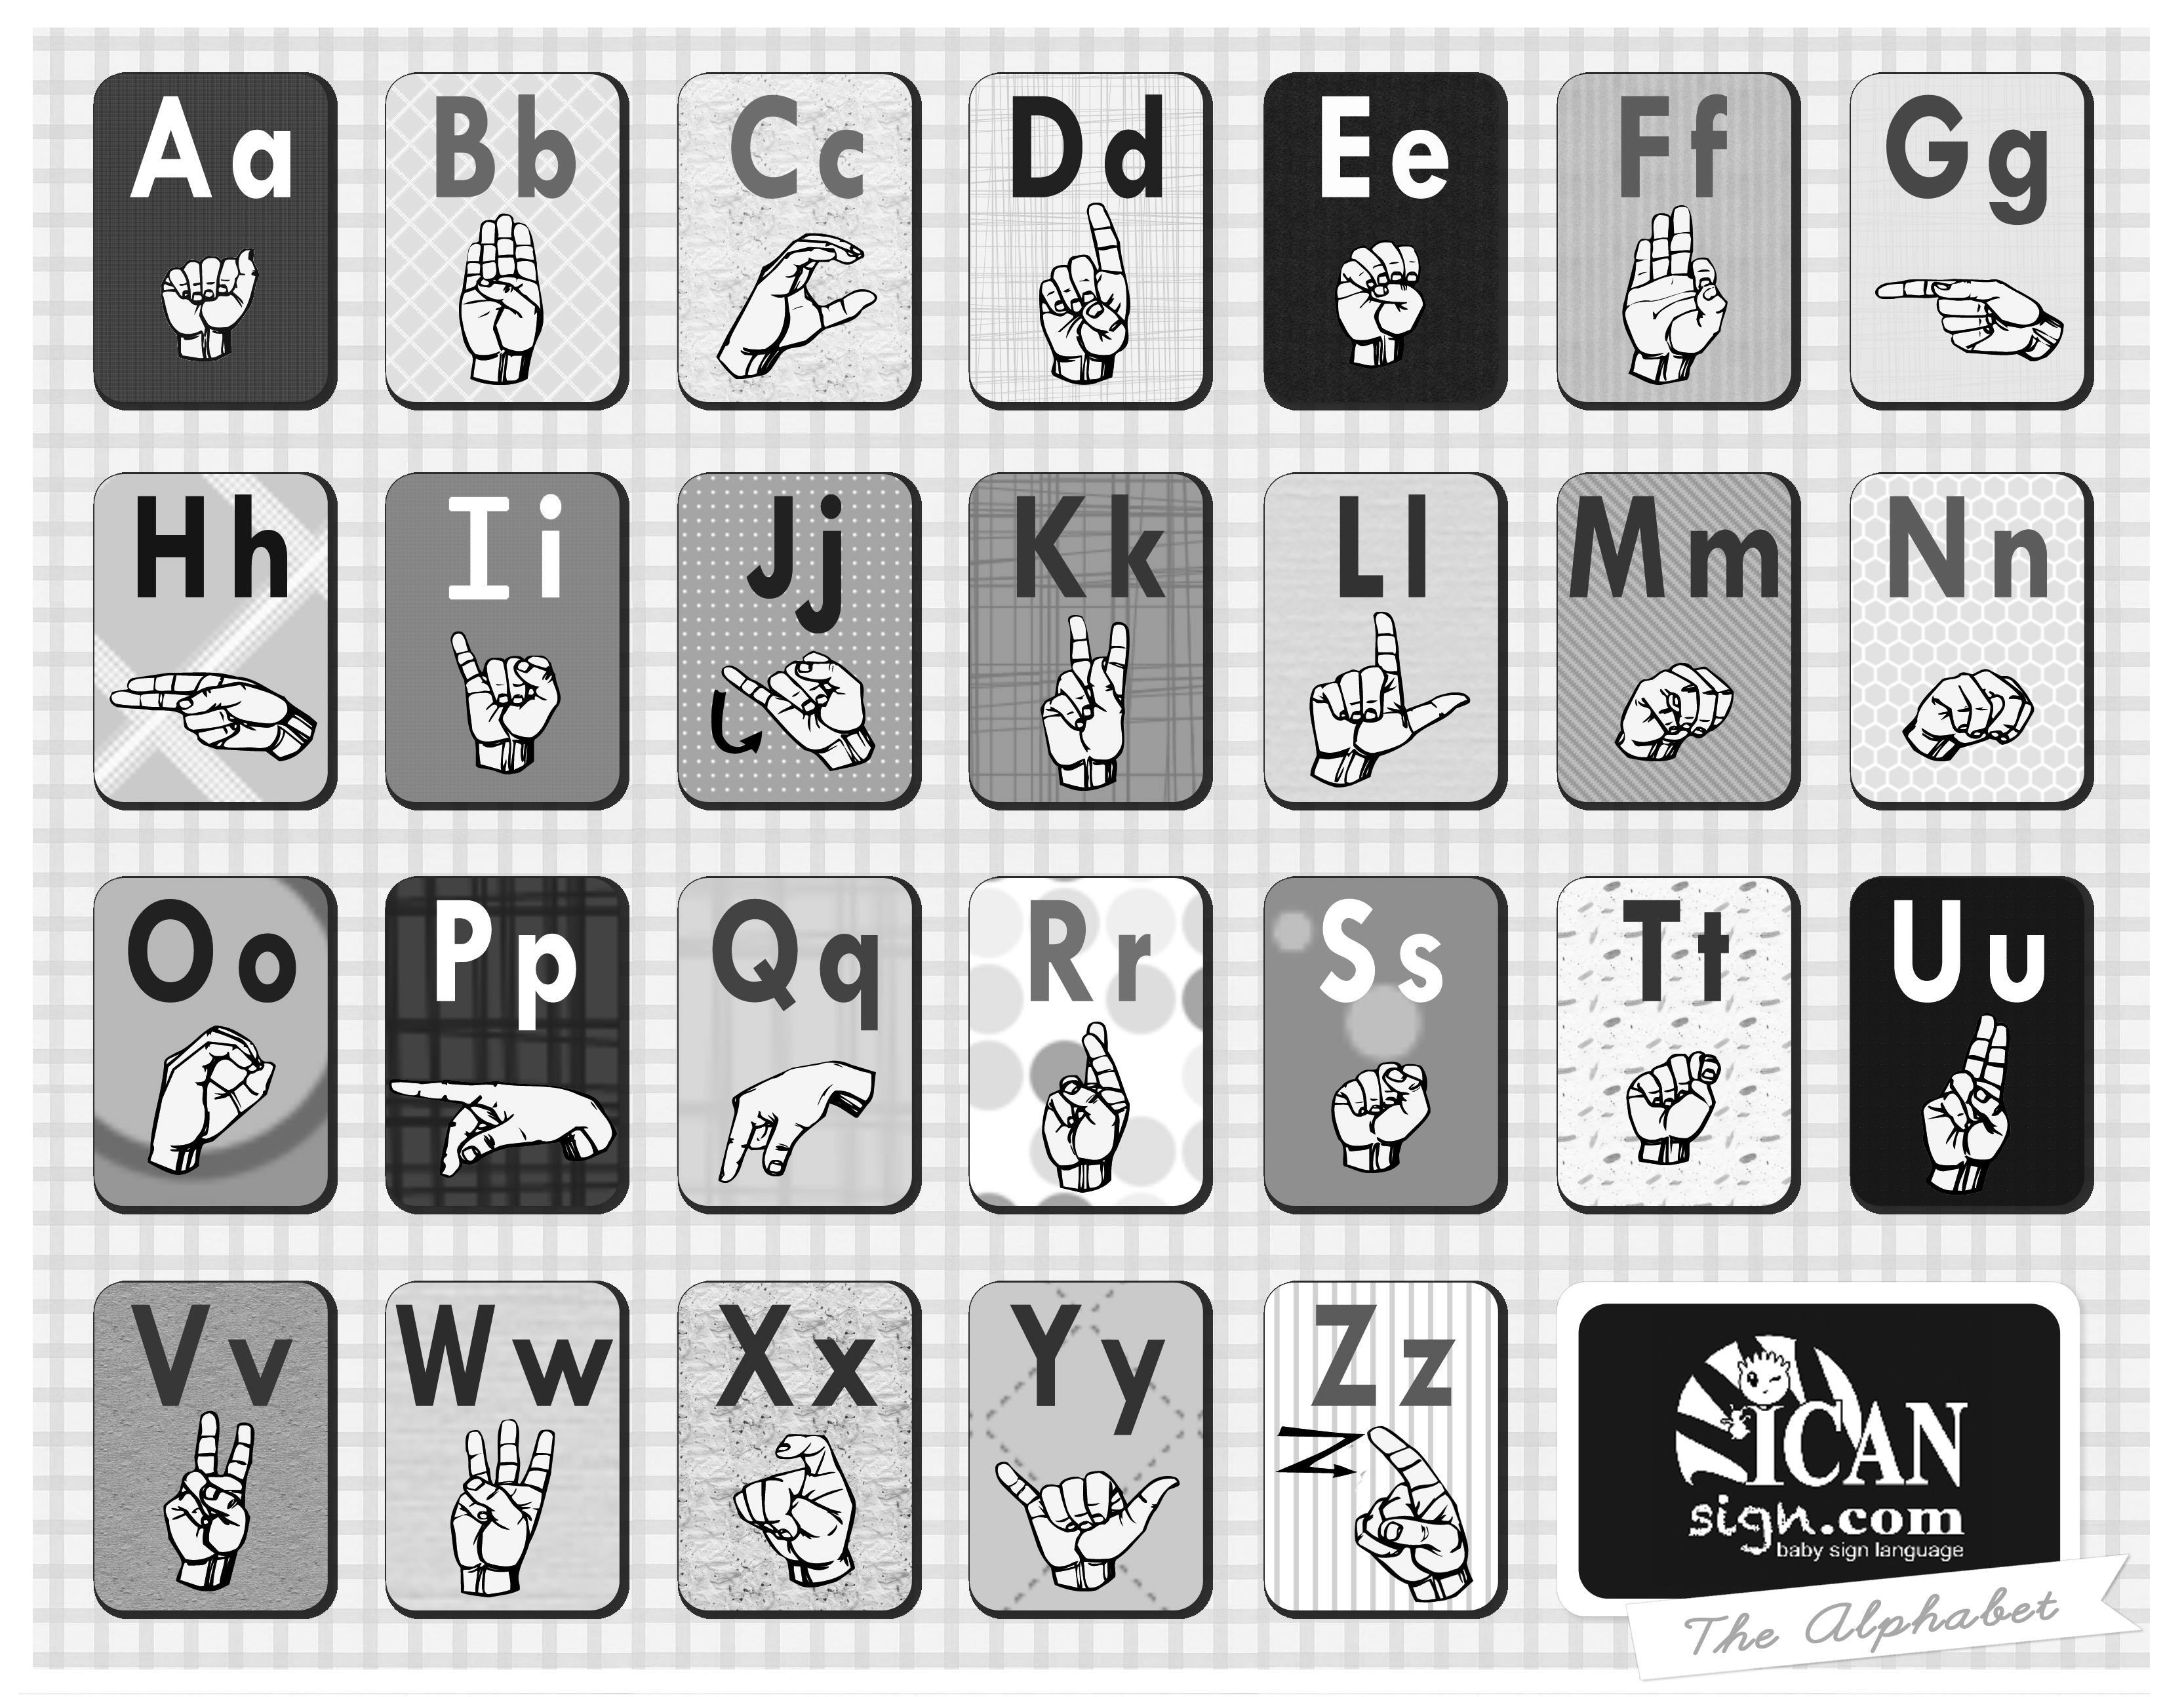 Asl Alphabet Chart And Asl Alphabet Flashcards | Baby Sign Language - Sign Language Flash Cards Free Printable